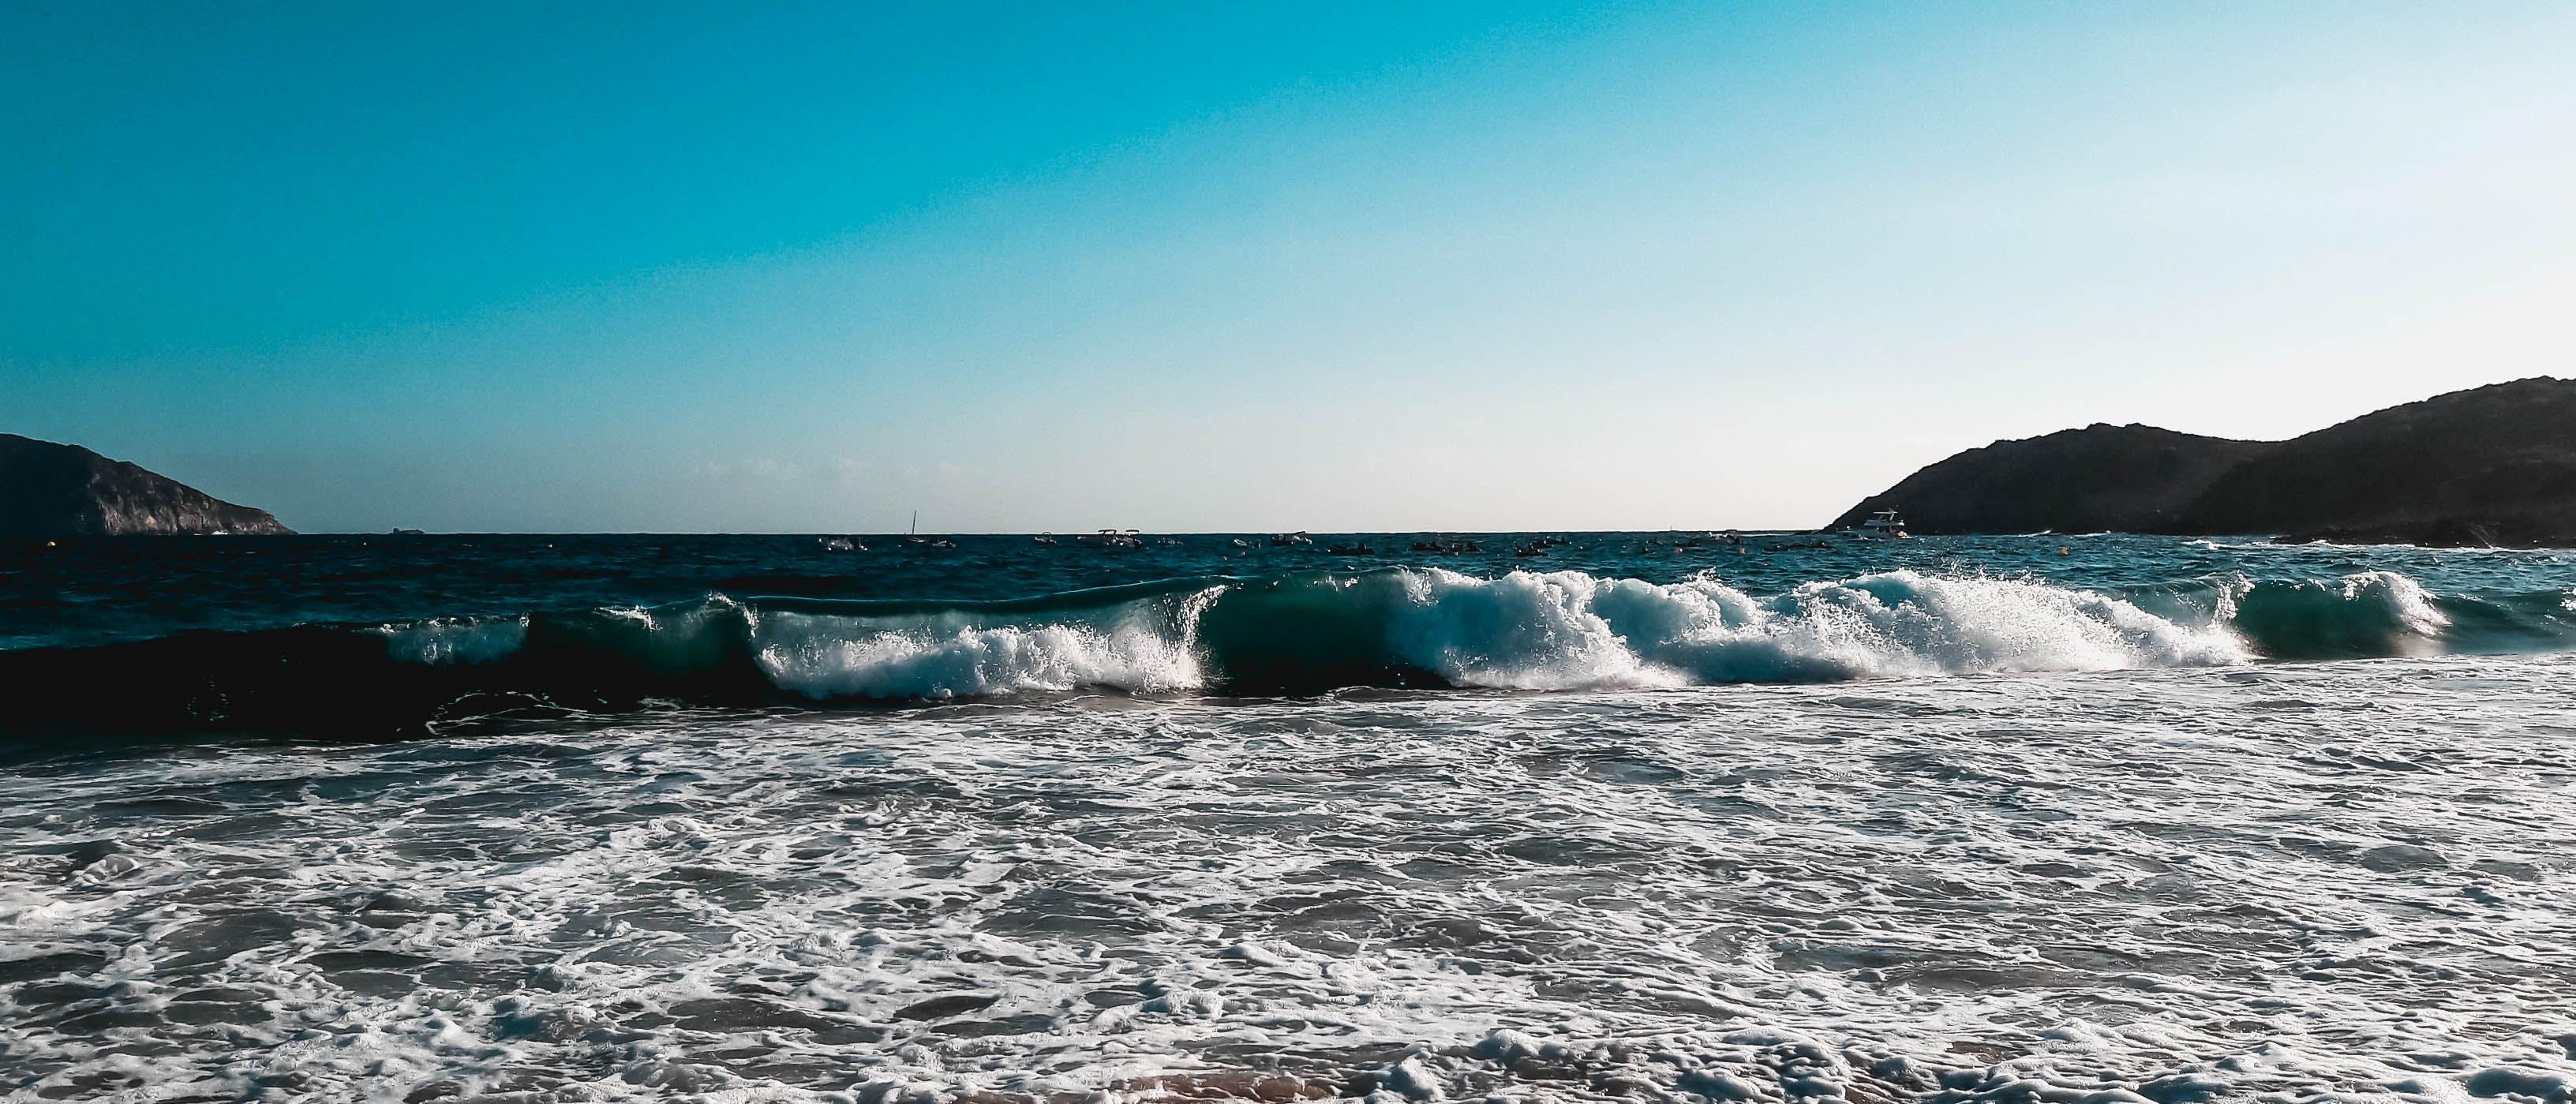 Gratis arkivbilde med brytende bølger, bølger, himmel, korsika